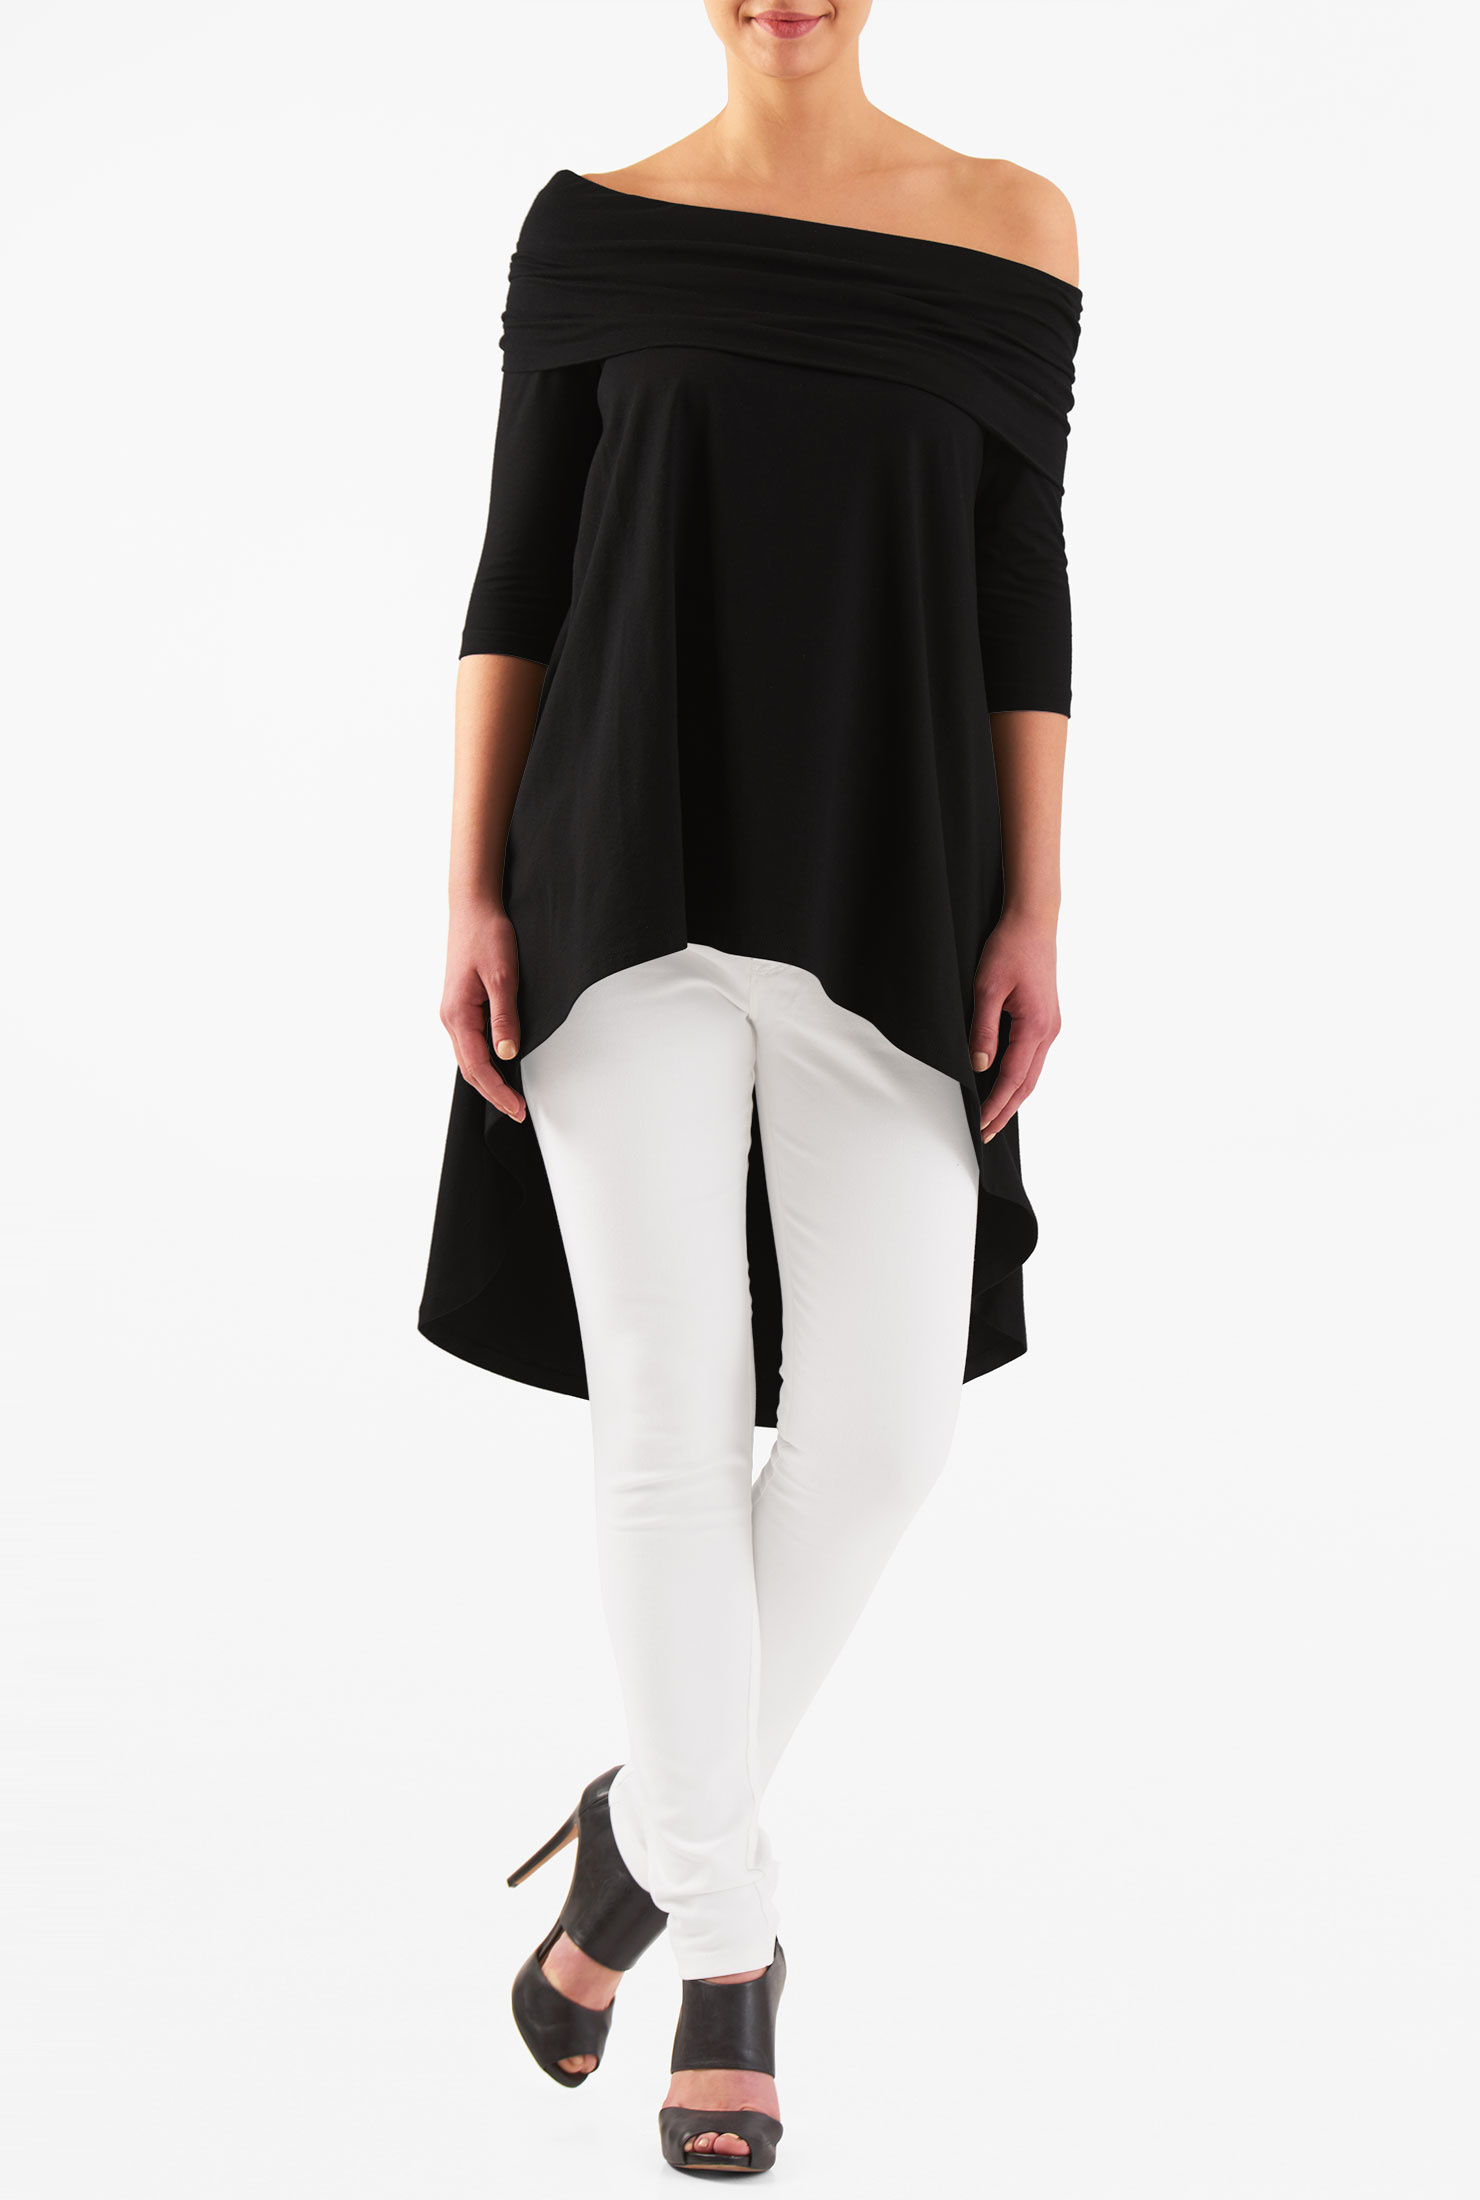 Eshakti Women S Off Shoulder Asymmetric Hem Cotton Knit Top image